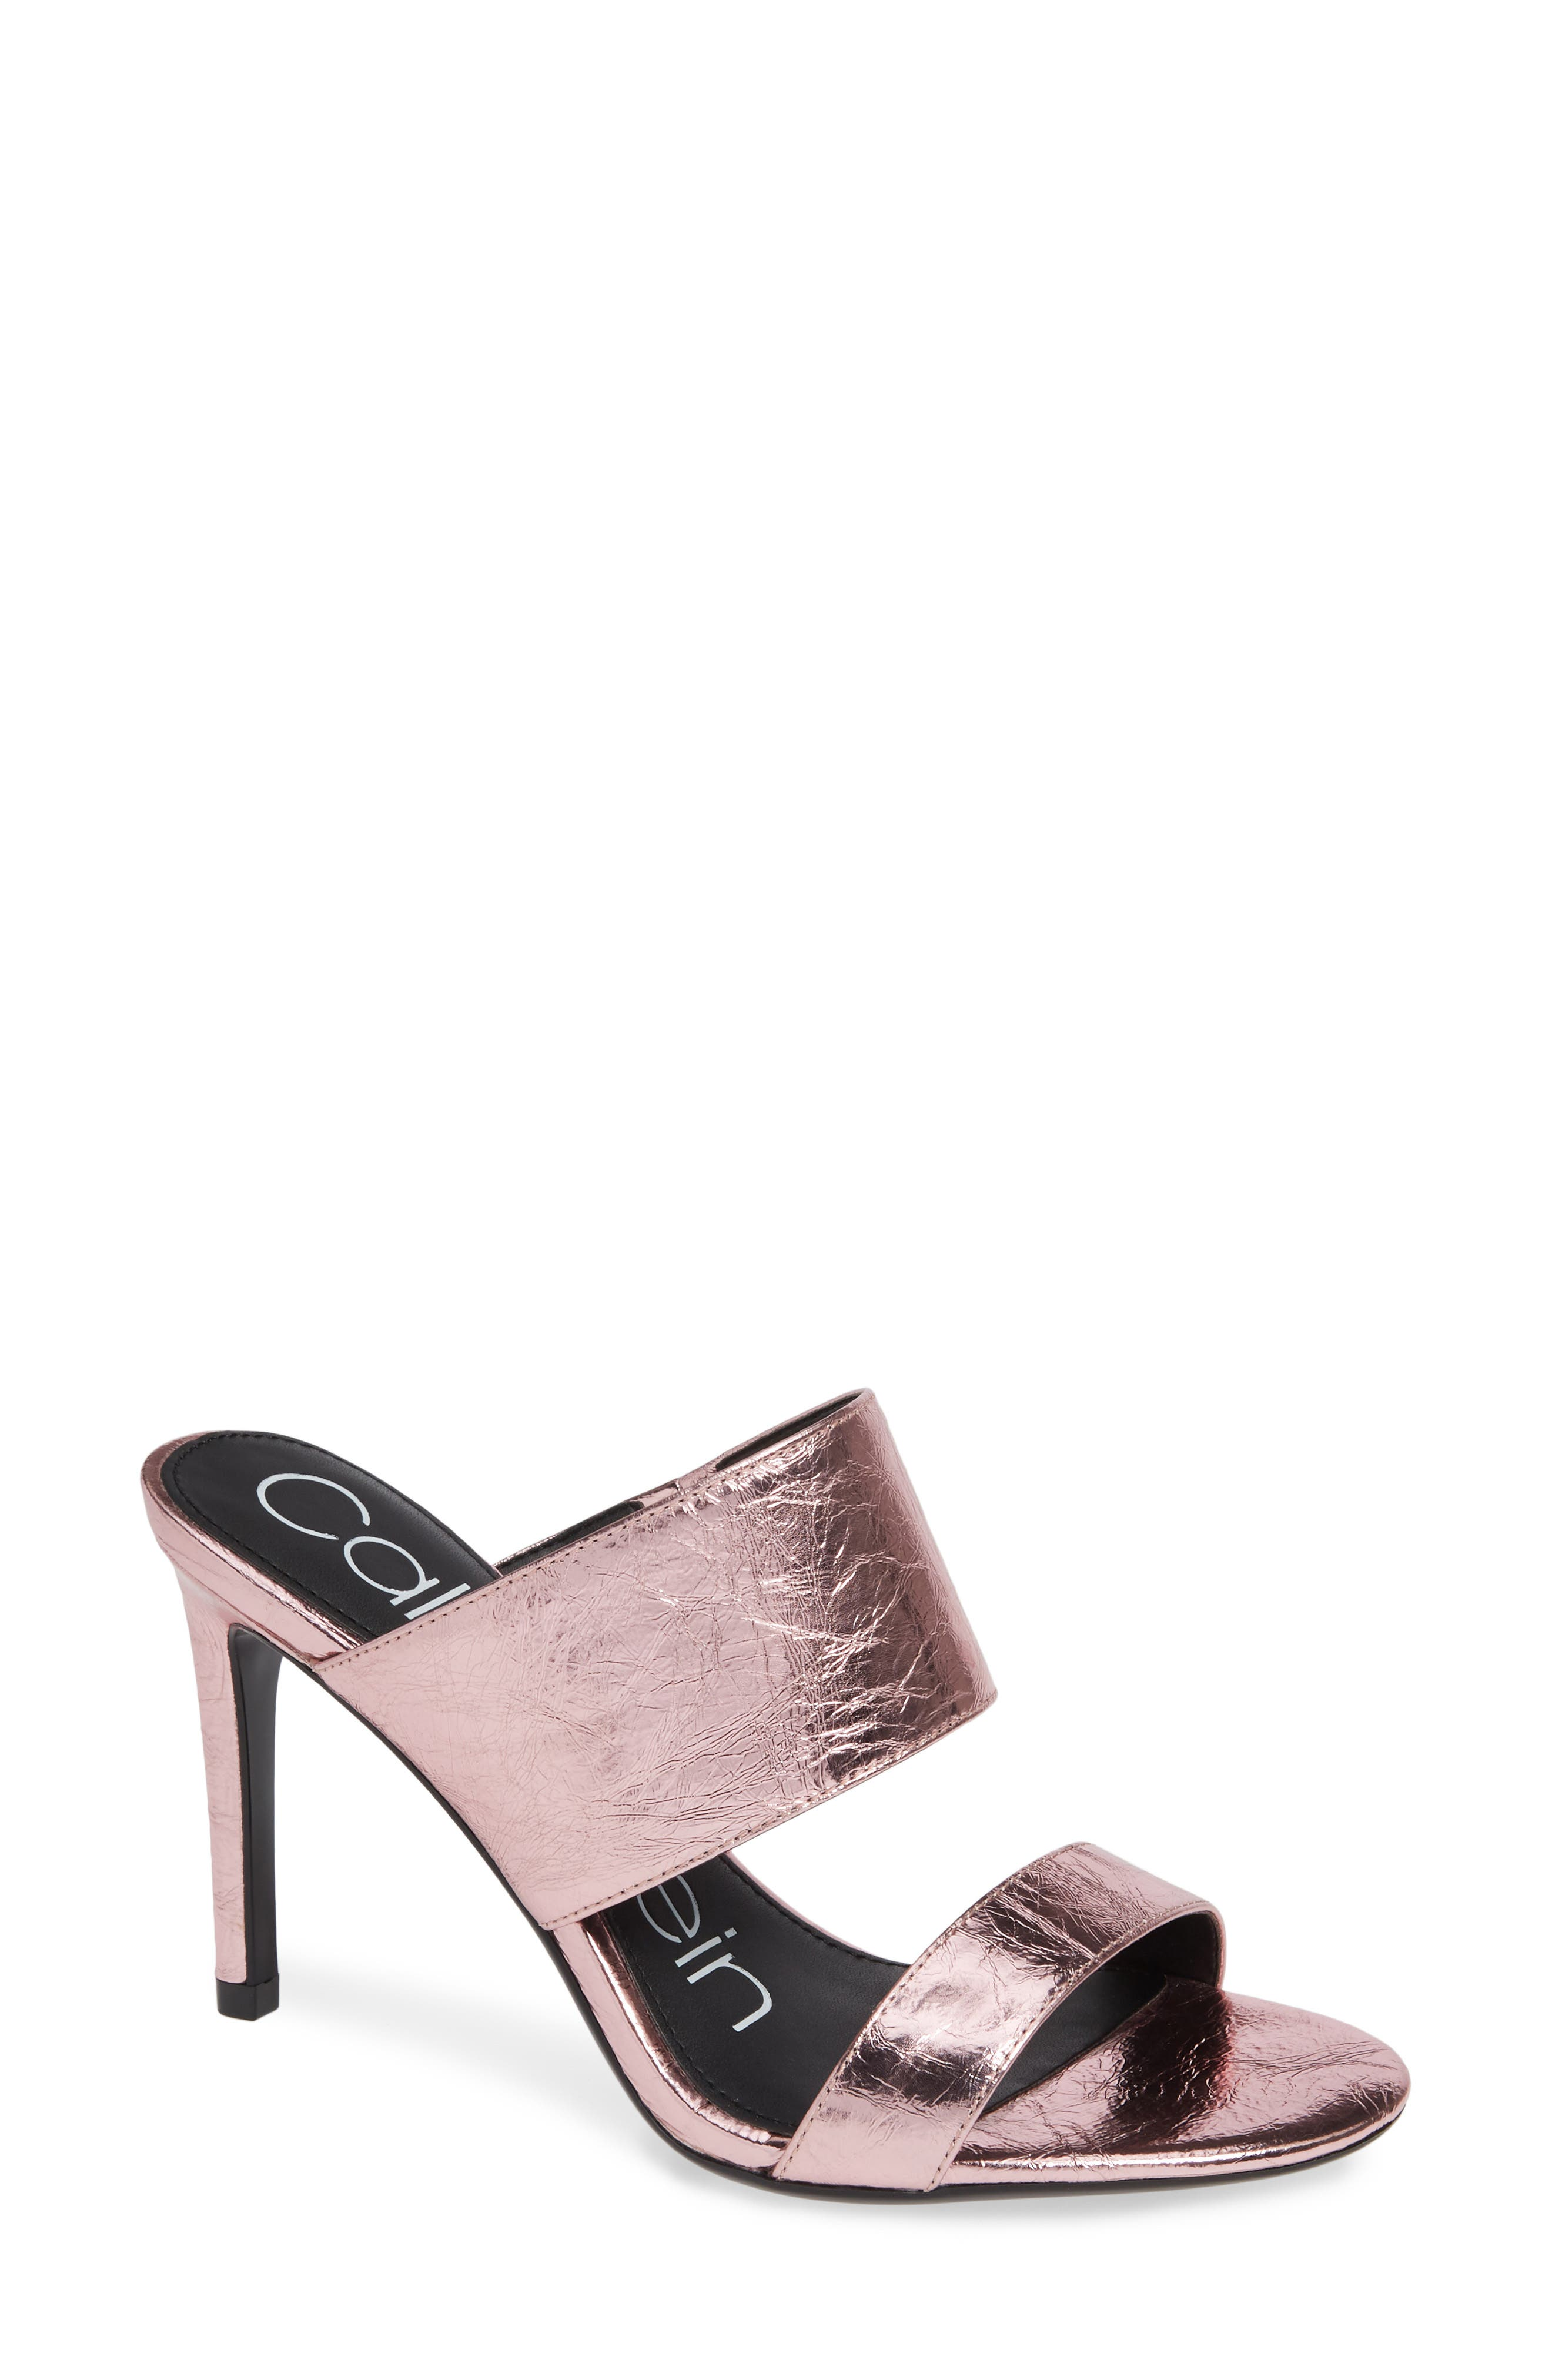 Calvin Klein Rema Slide Sandal, Pink